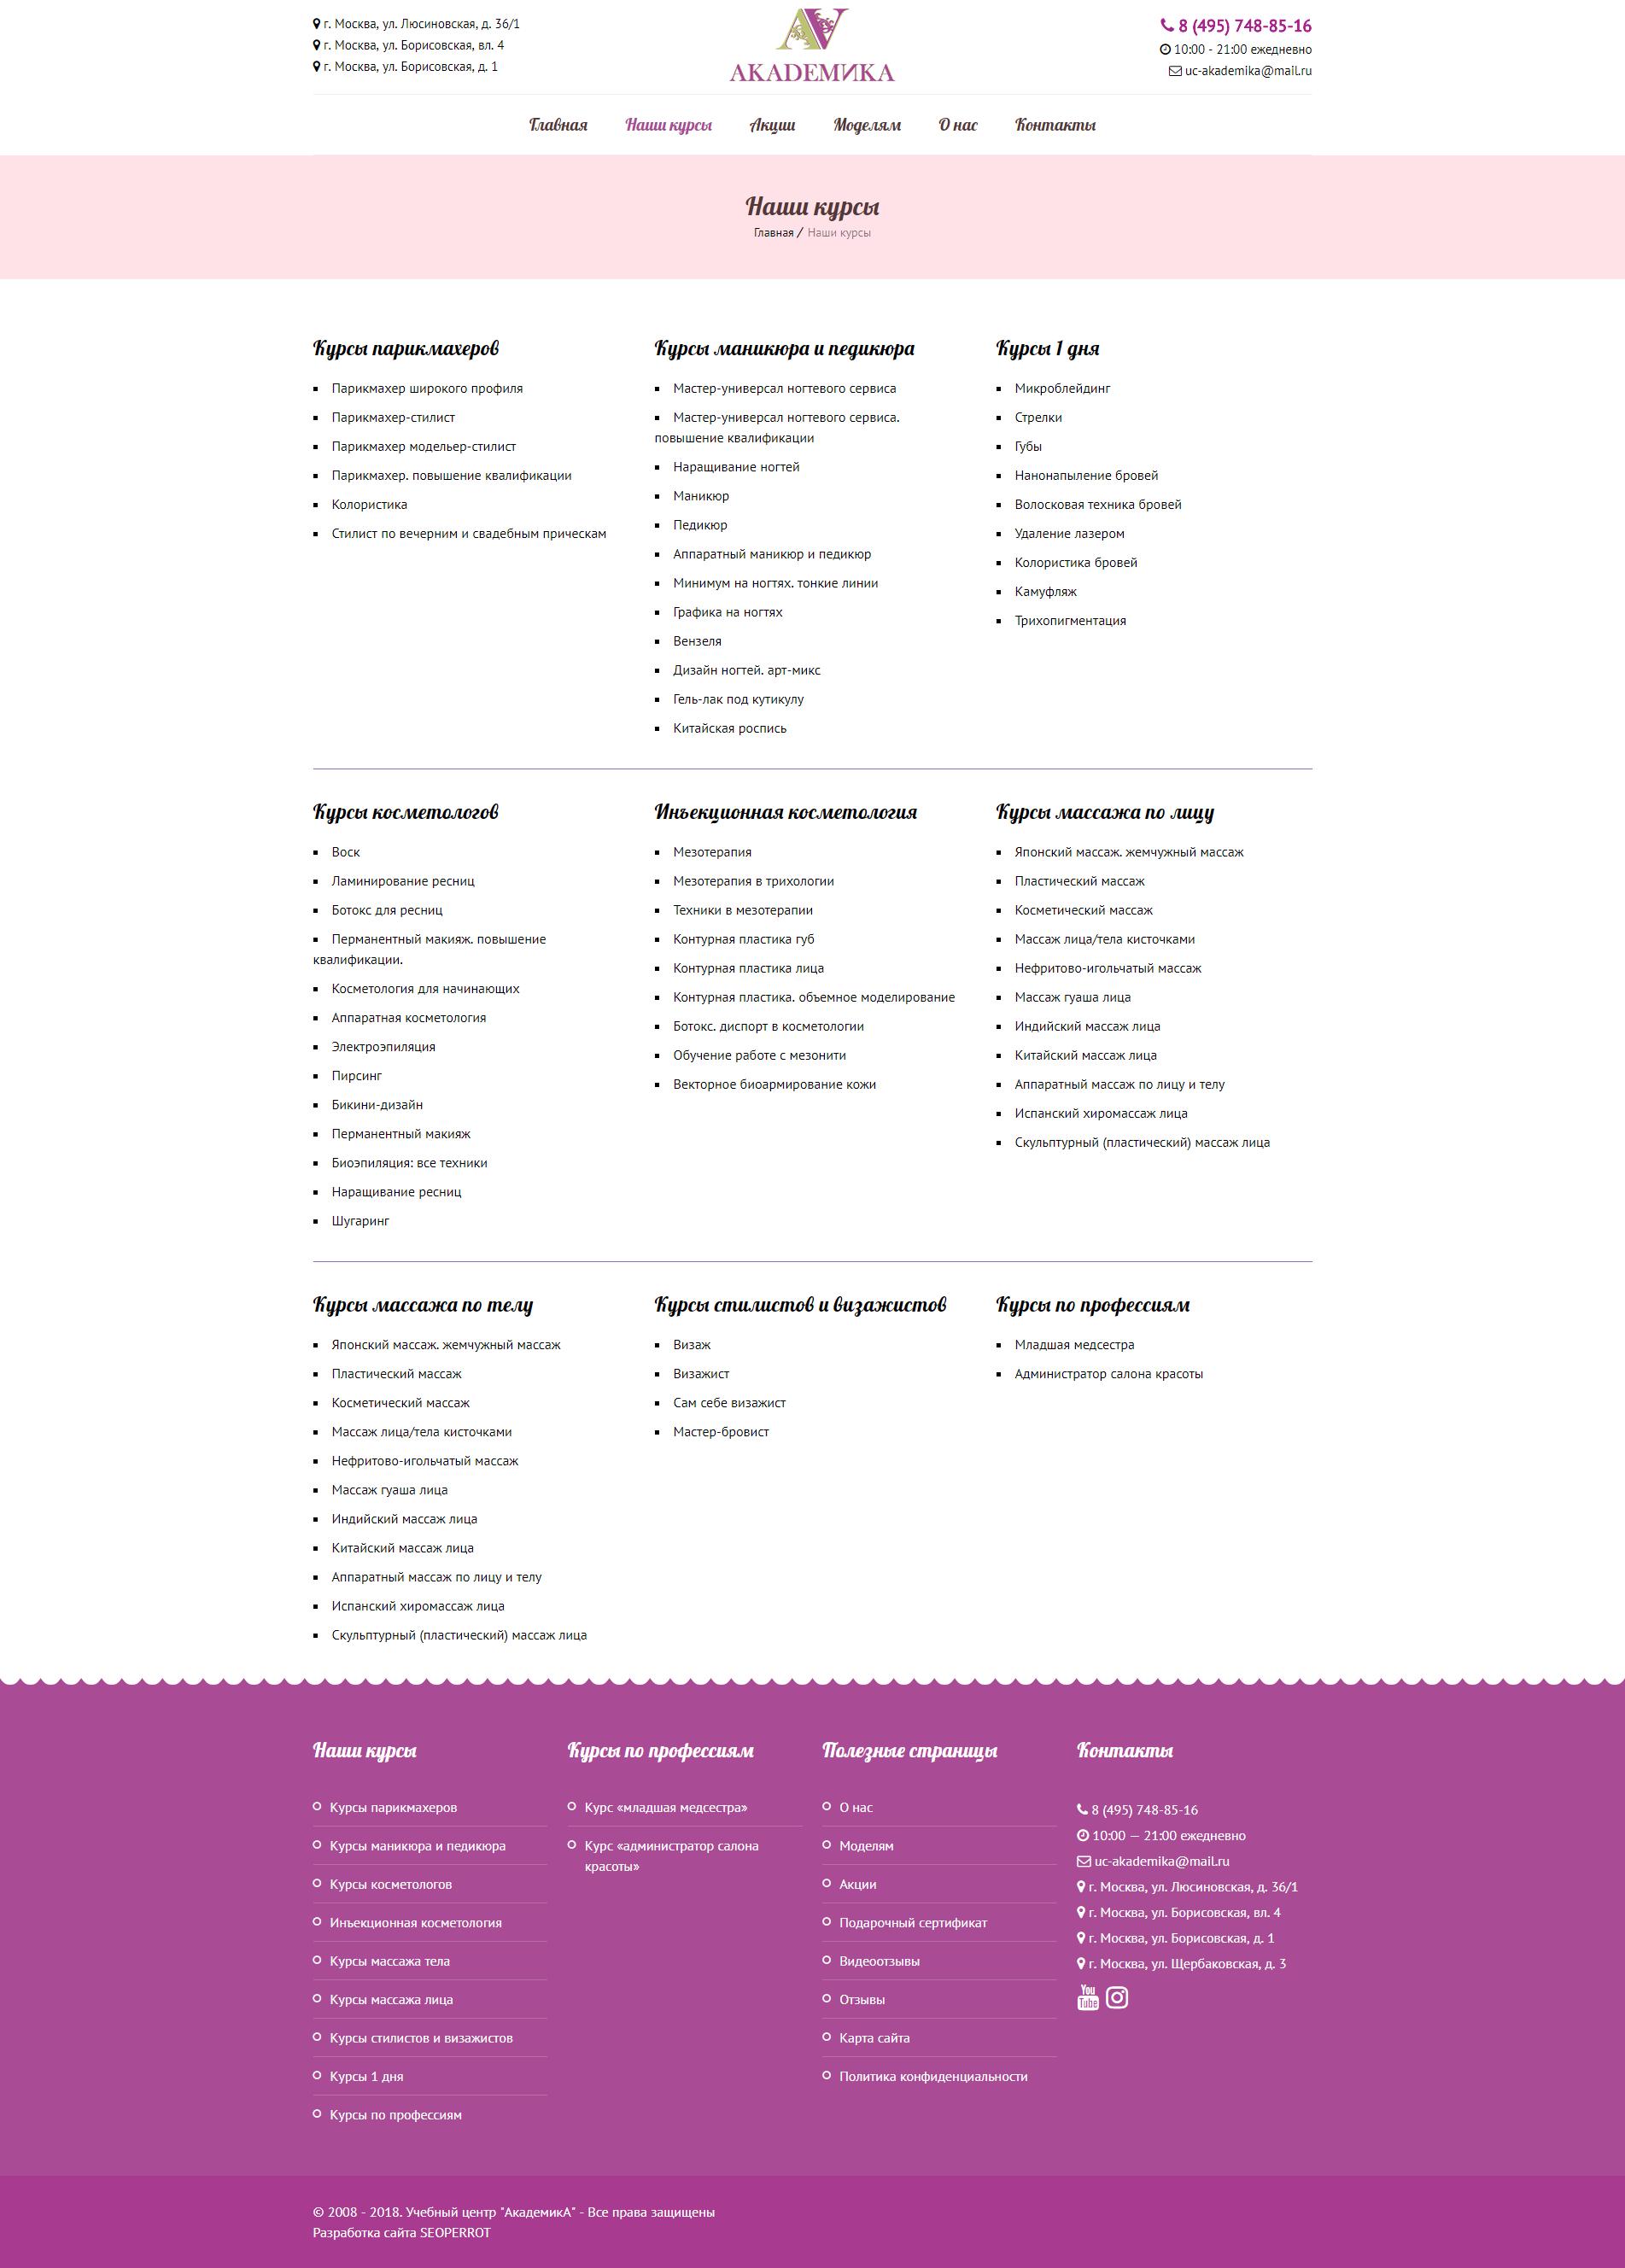 Раздел сайта учебного центра